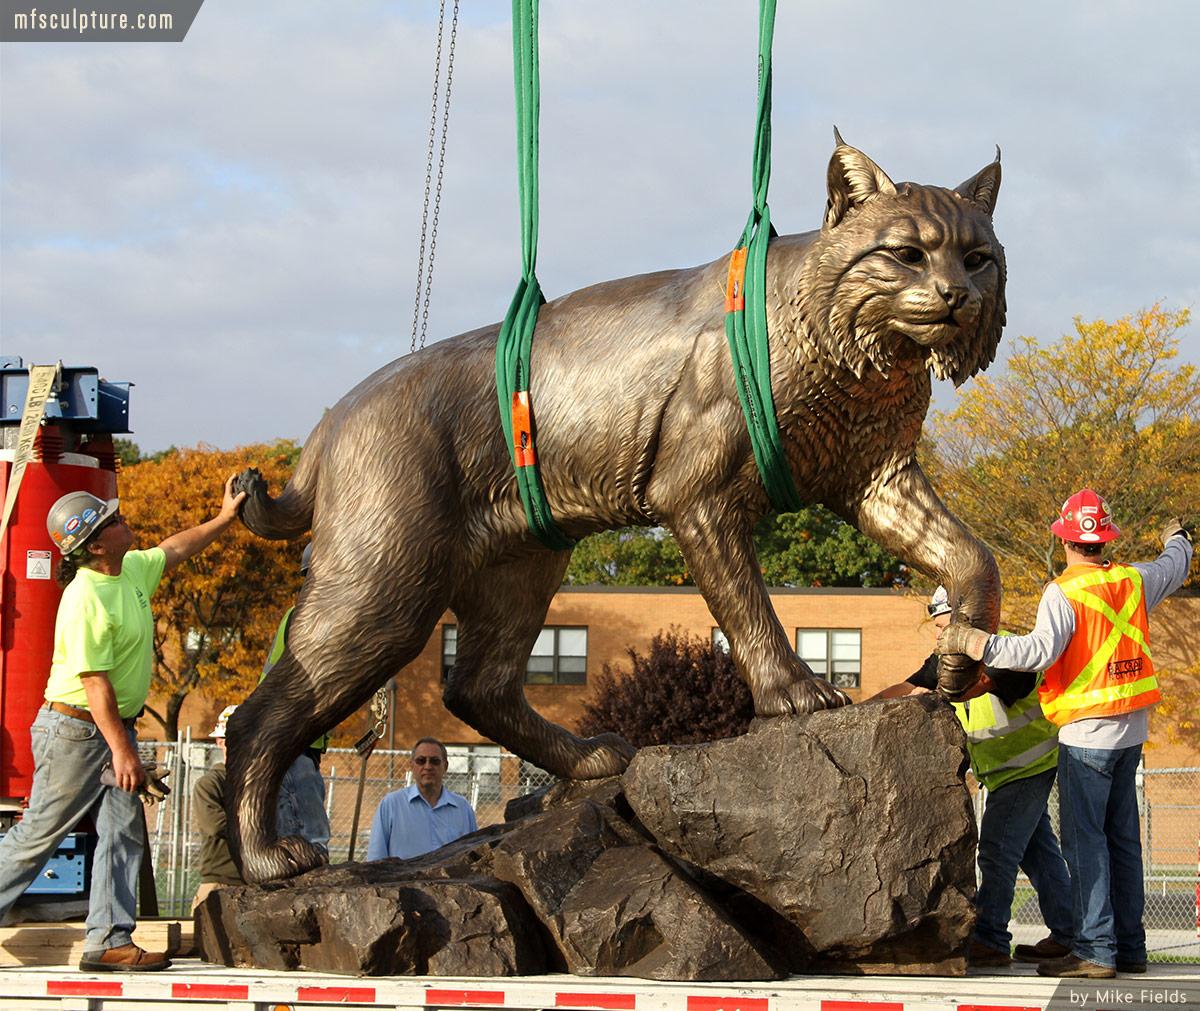 Wildcat Sculpture University Mascot Monument Public Art 6